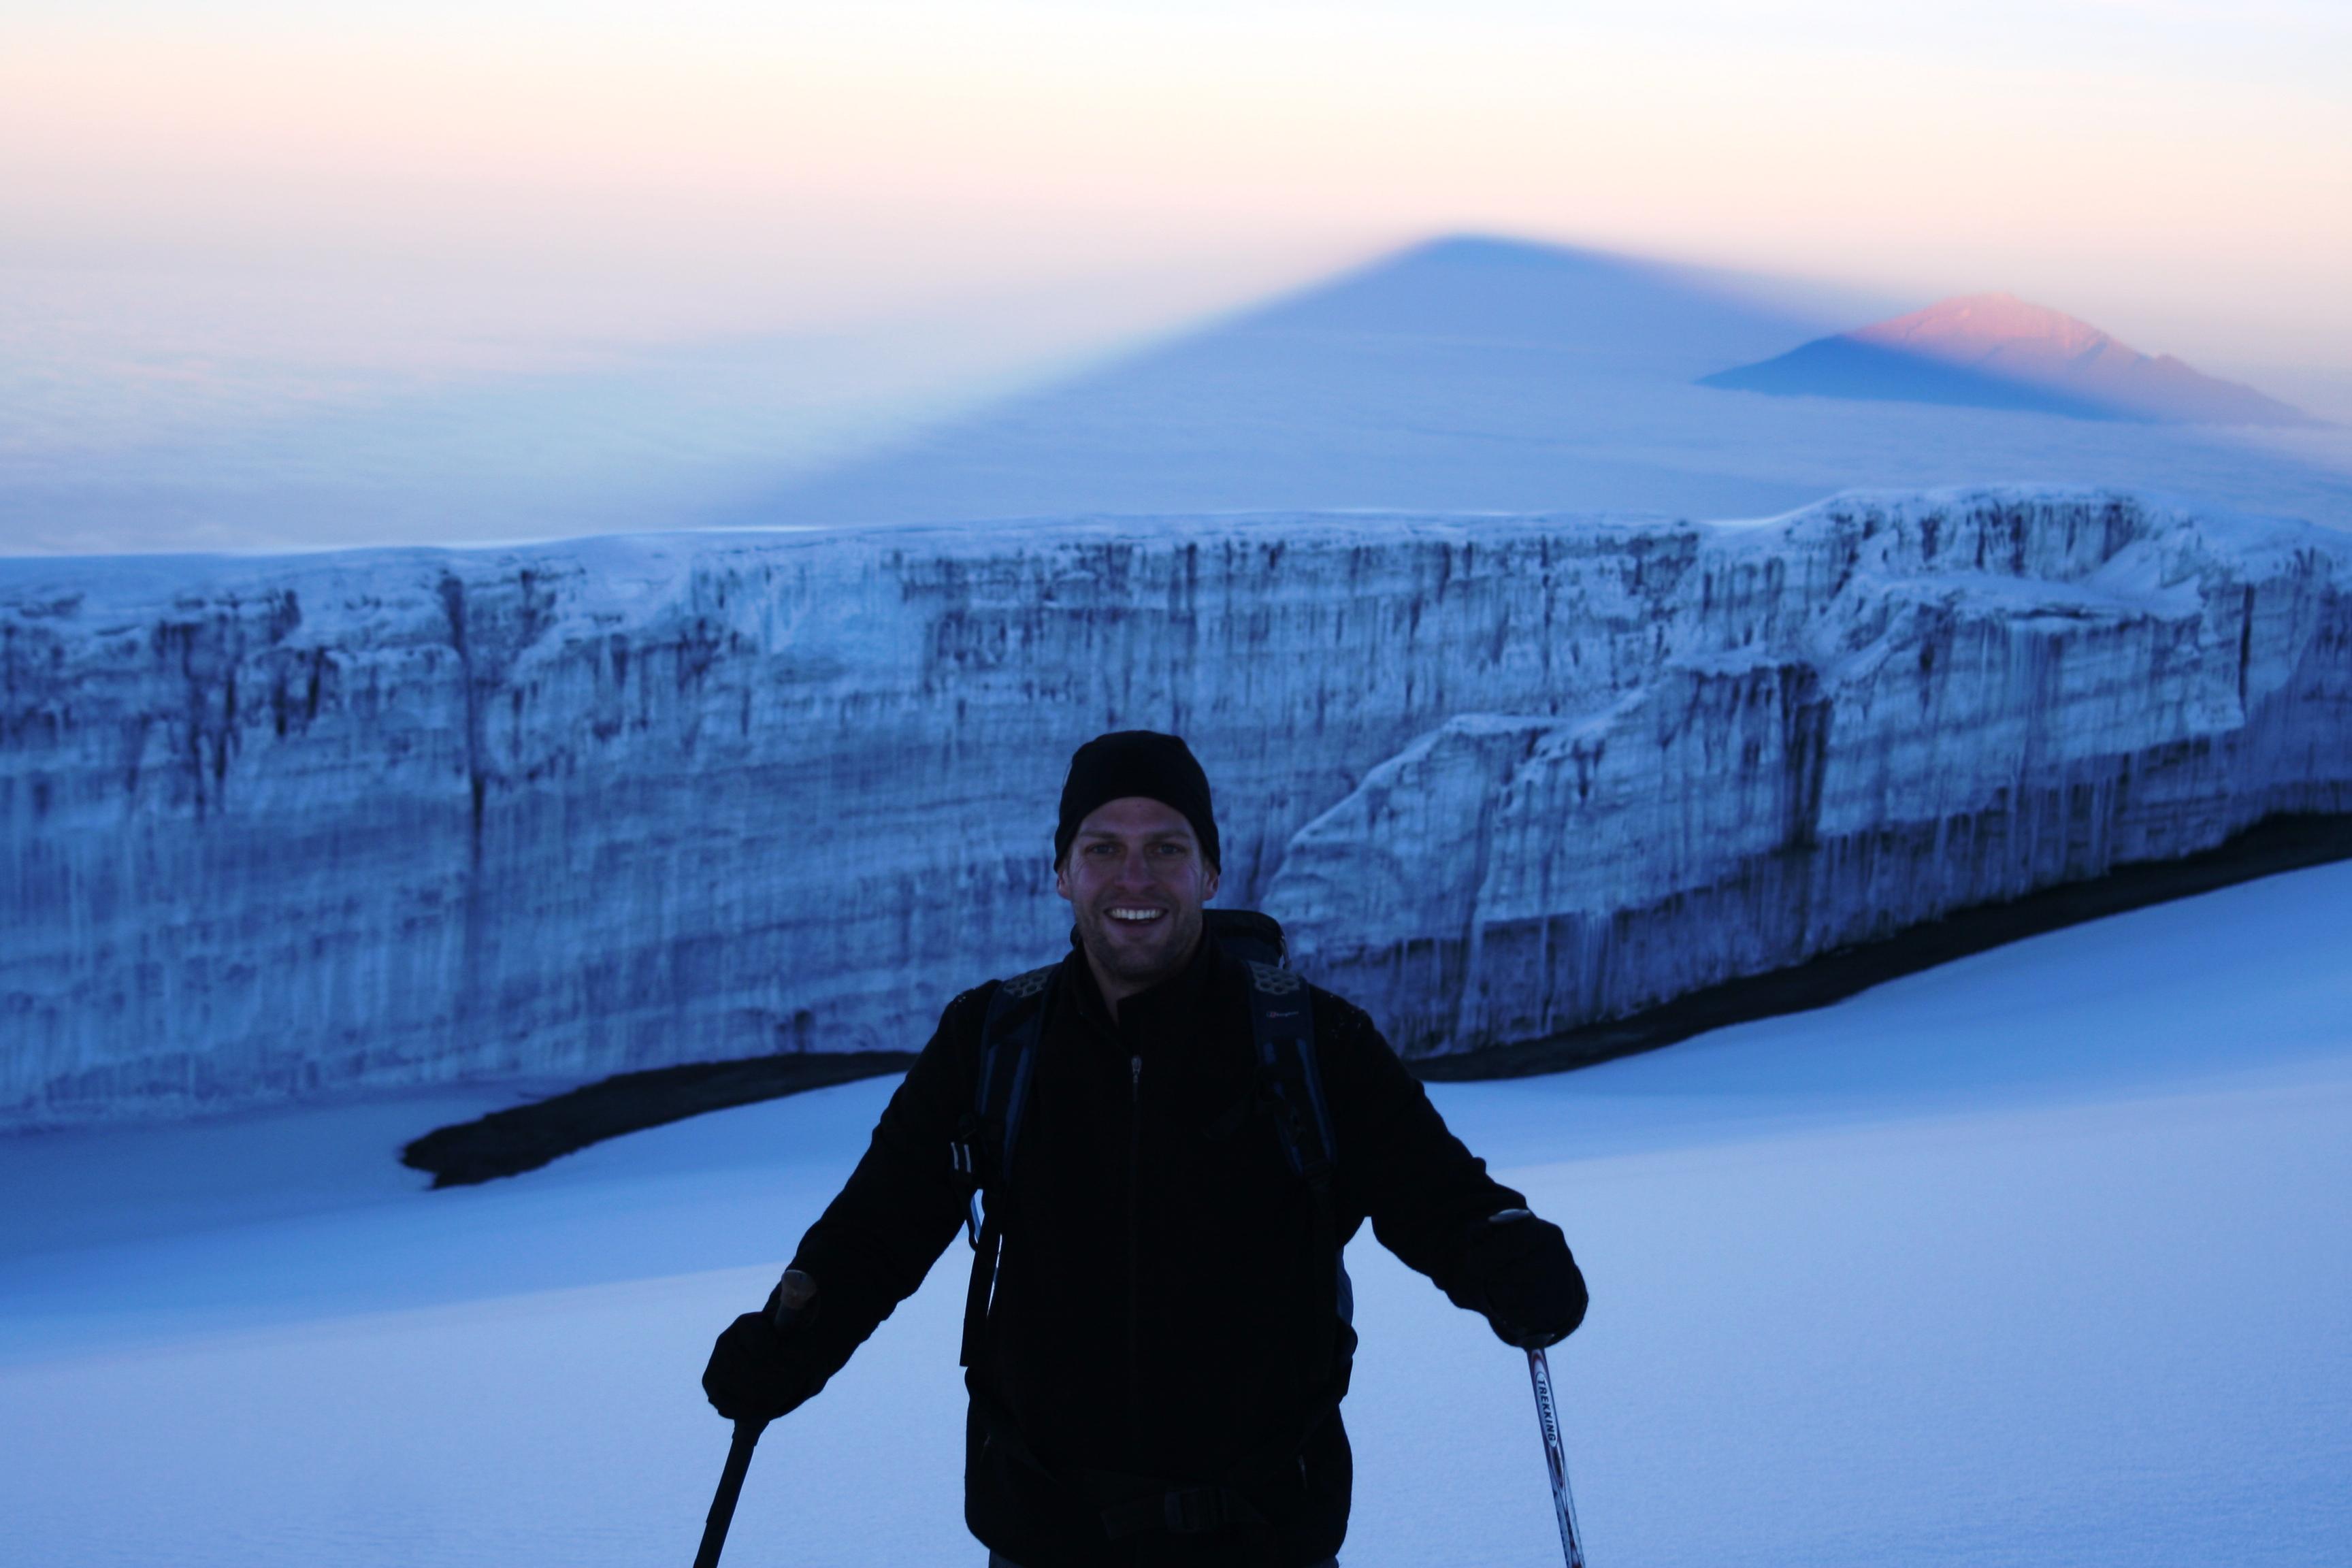 Ash Newland - Mt Kilimanjaro, Tanzania